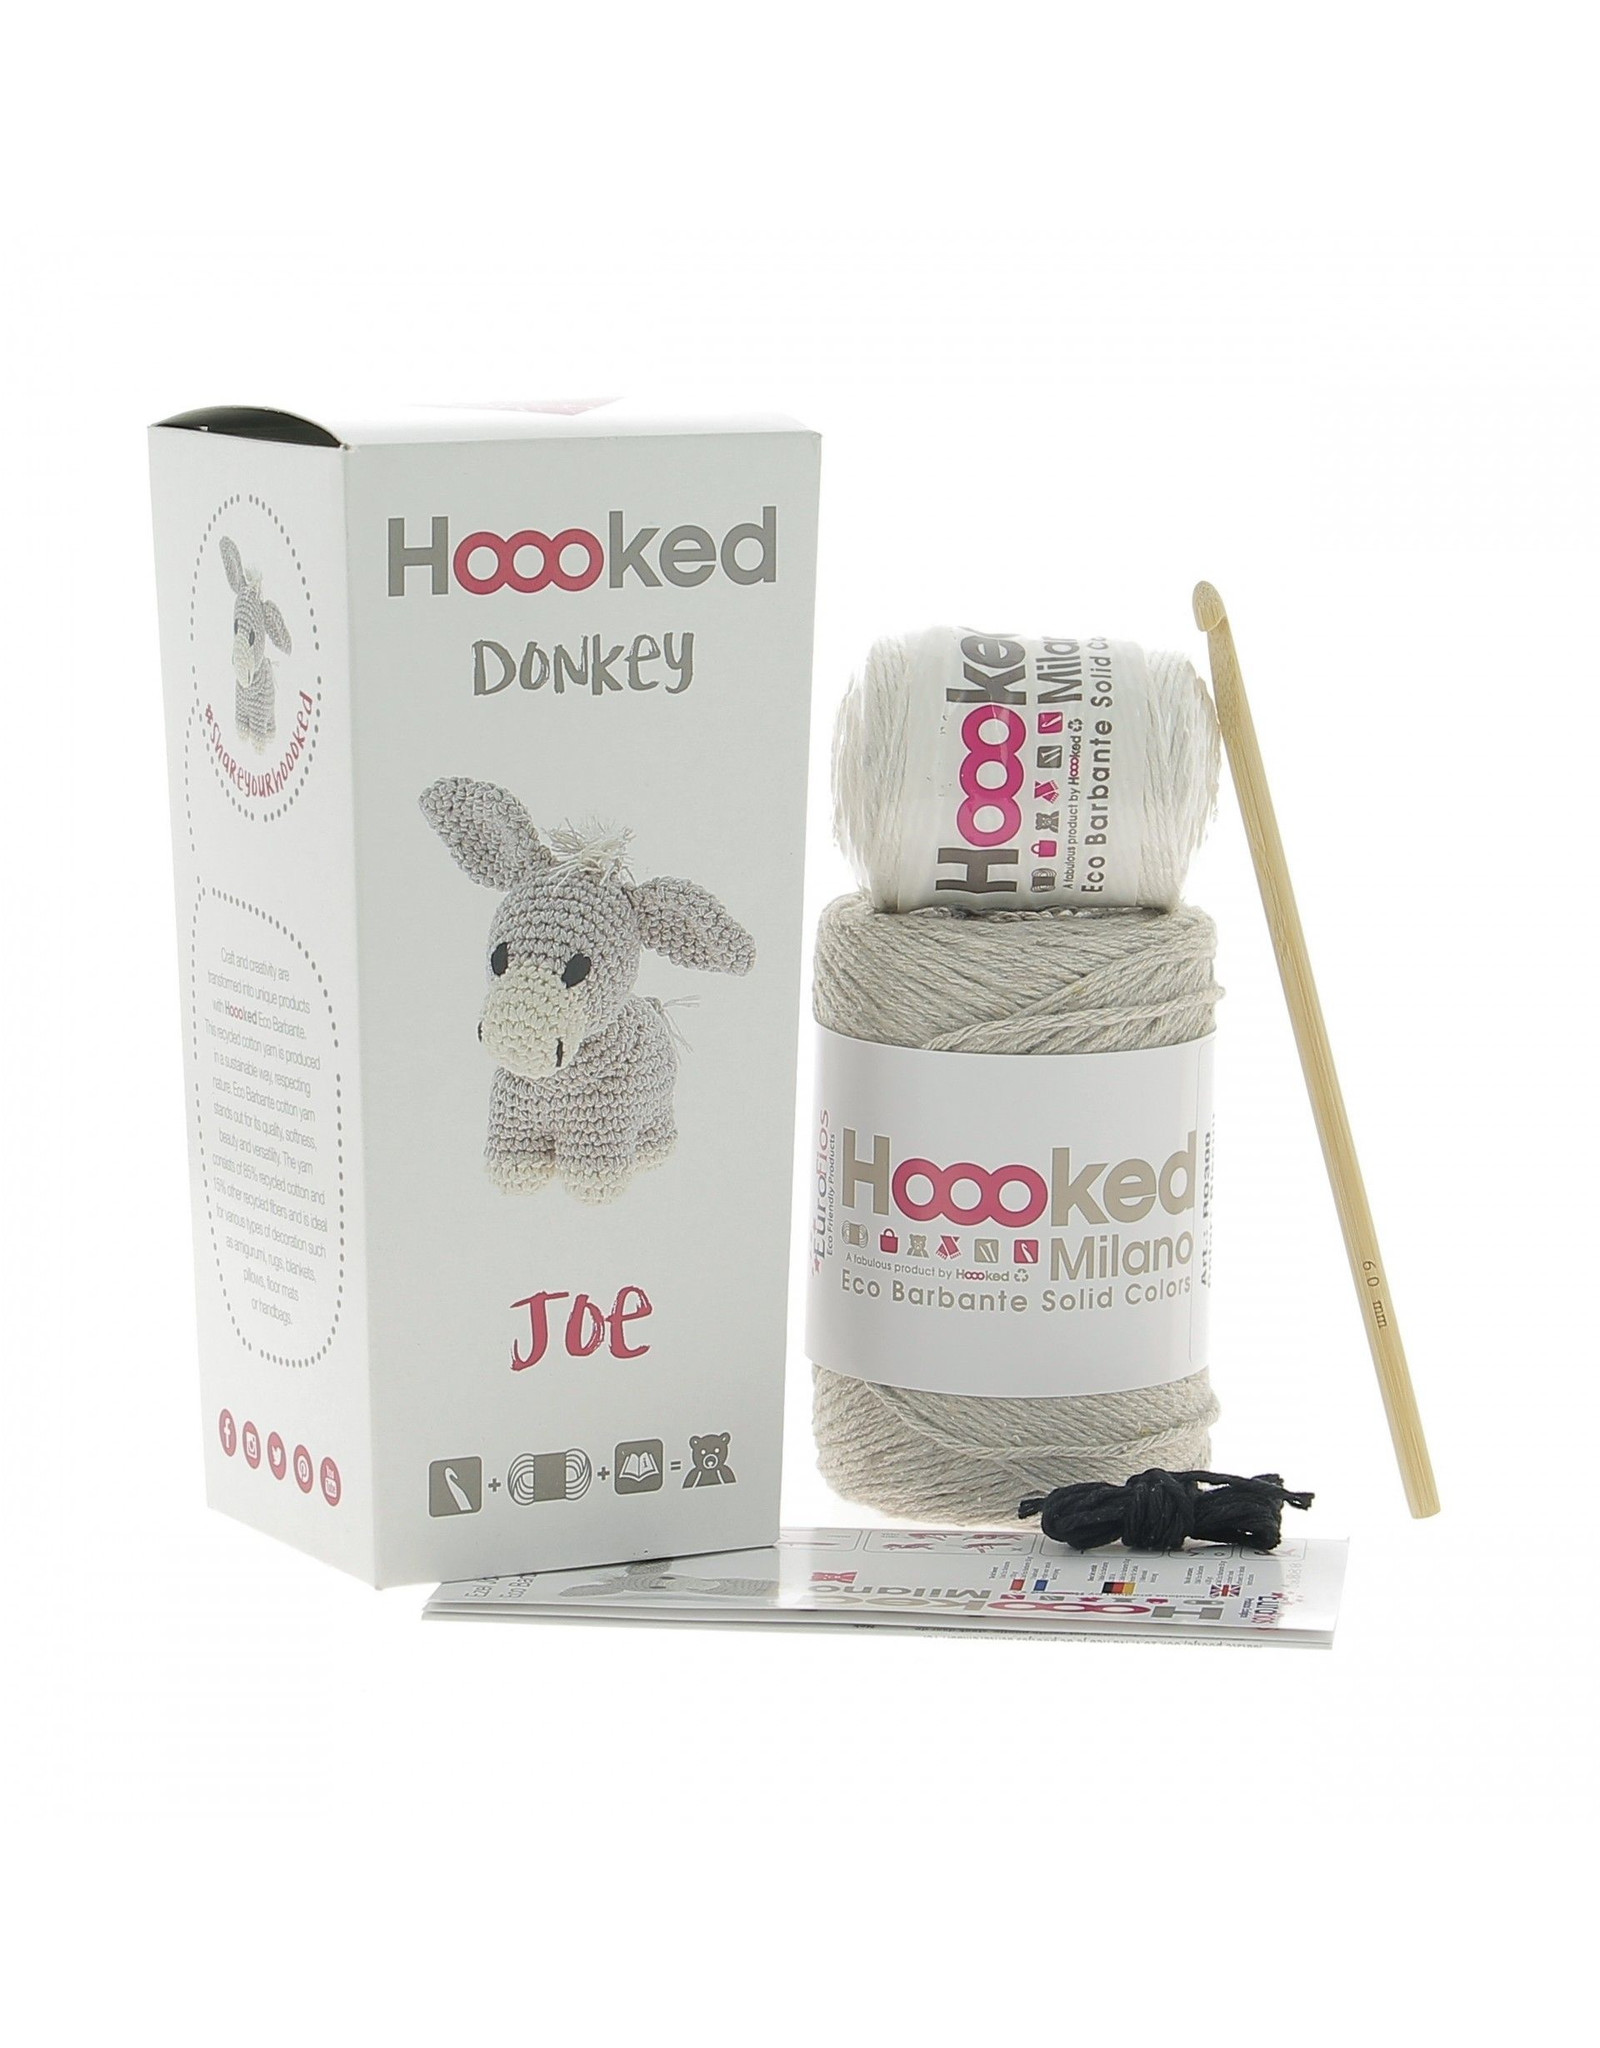 Hoooked Hoooked Amigurumi DIY Haakpakket Ezel Joe incl. 250 gr. vulling